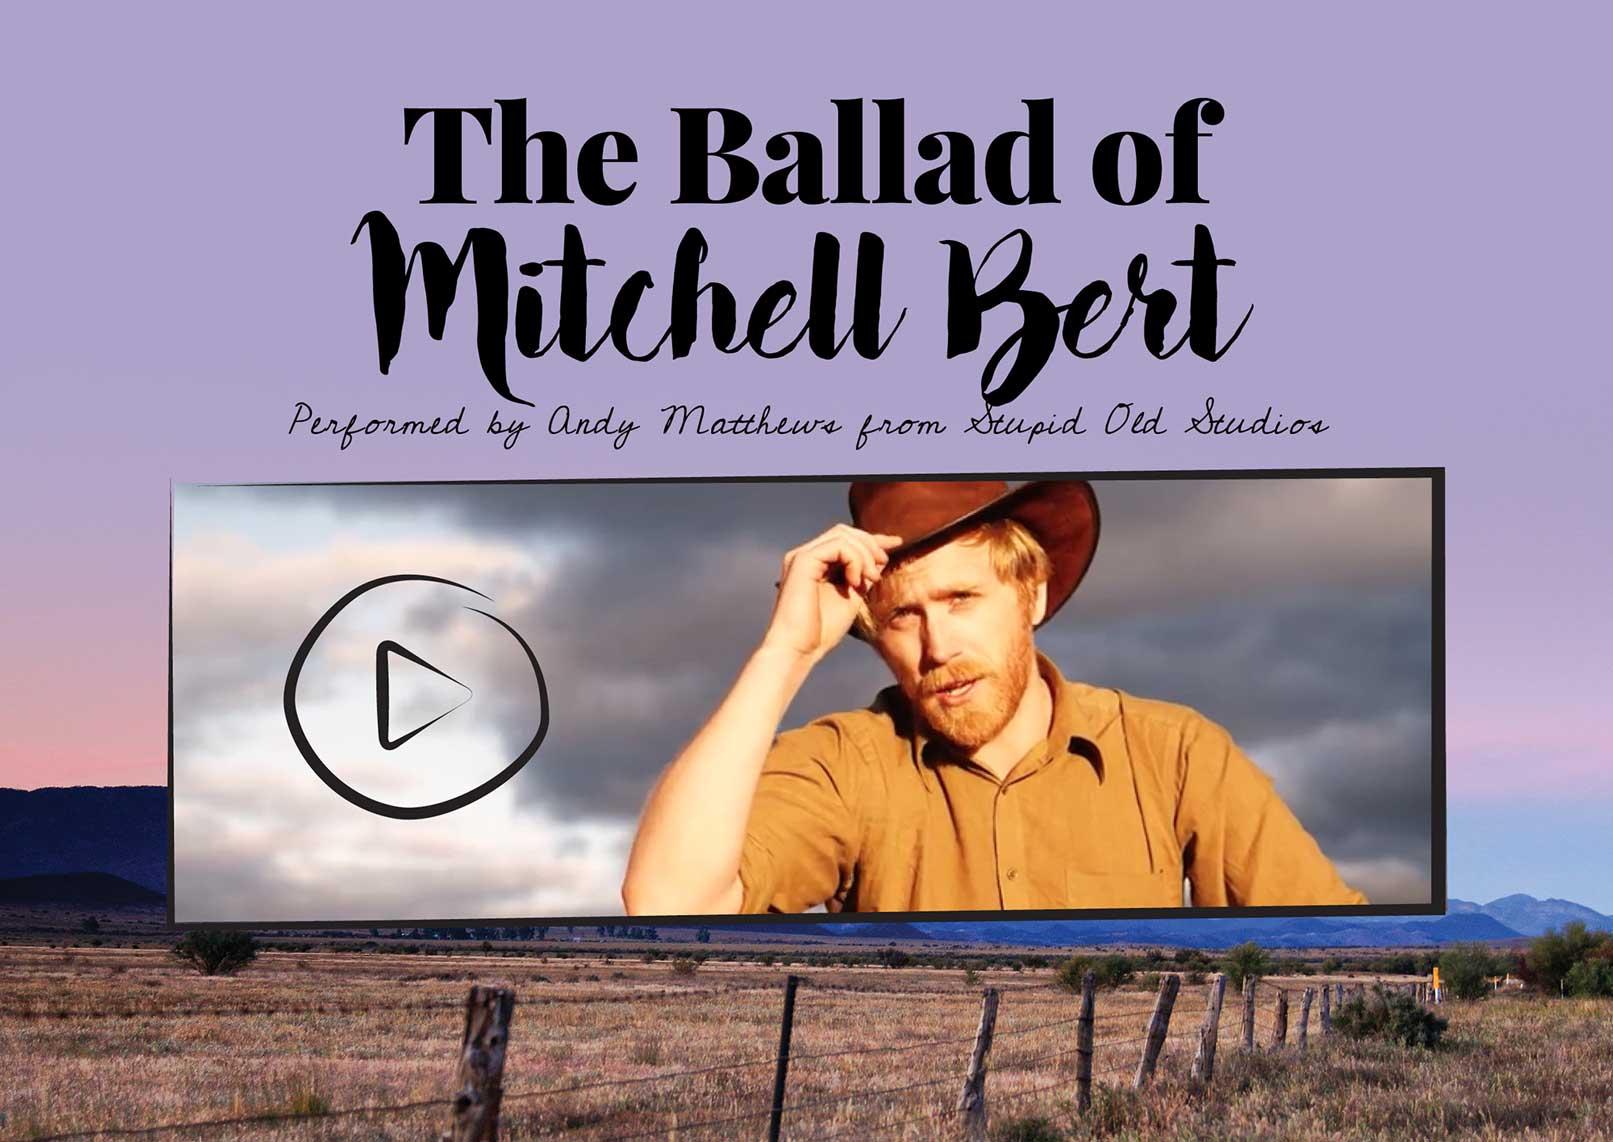 The Ballad of Mitchell Bert